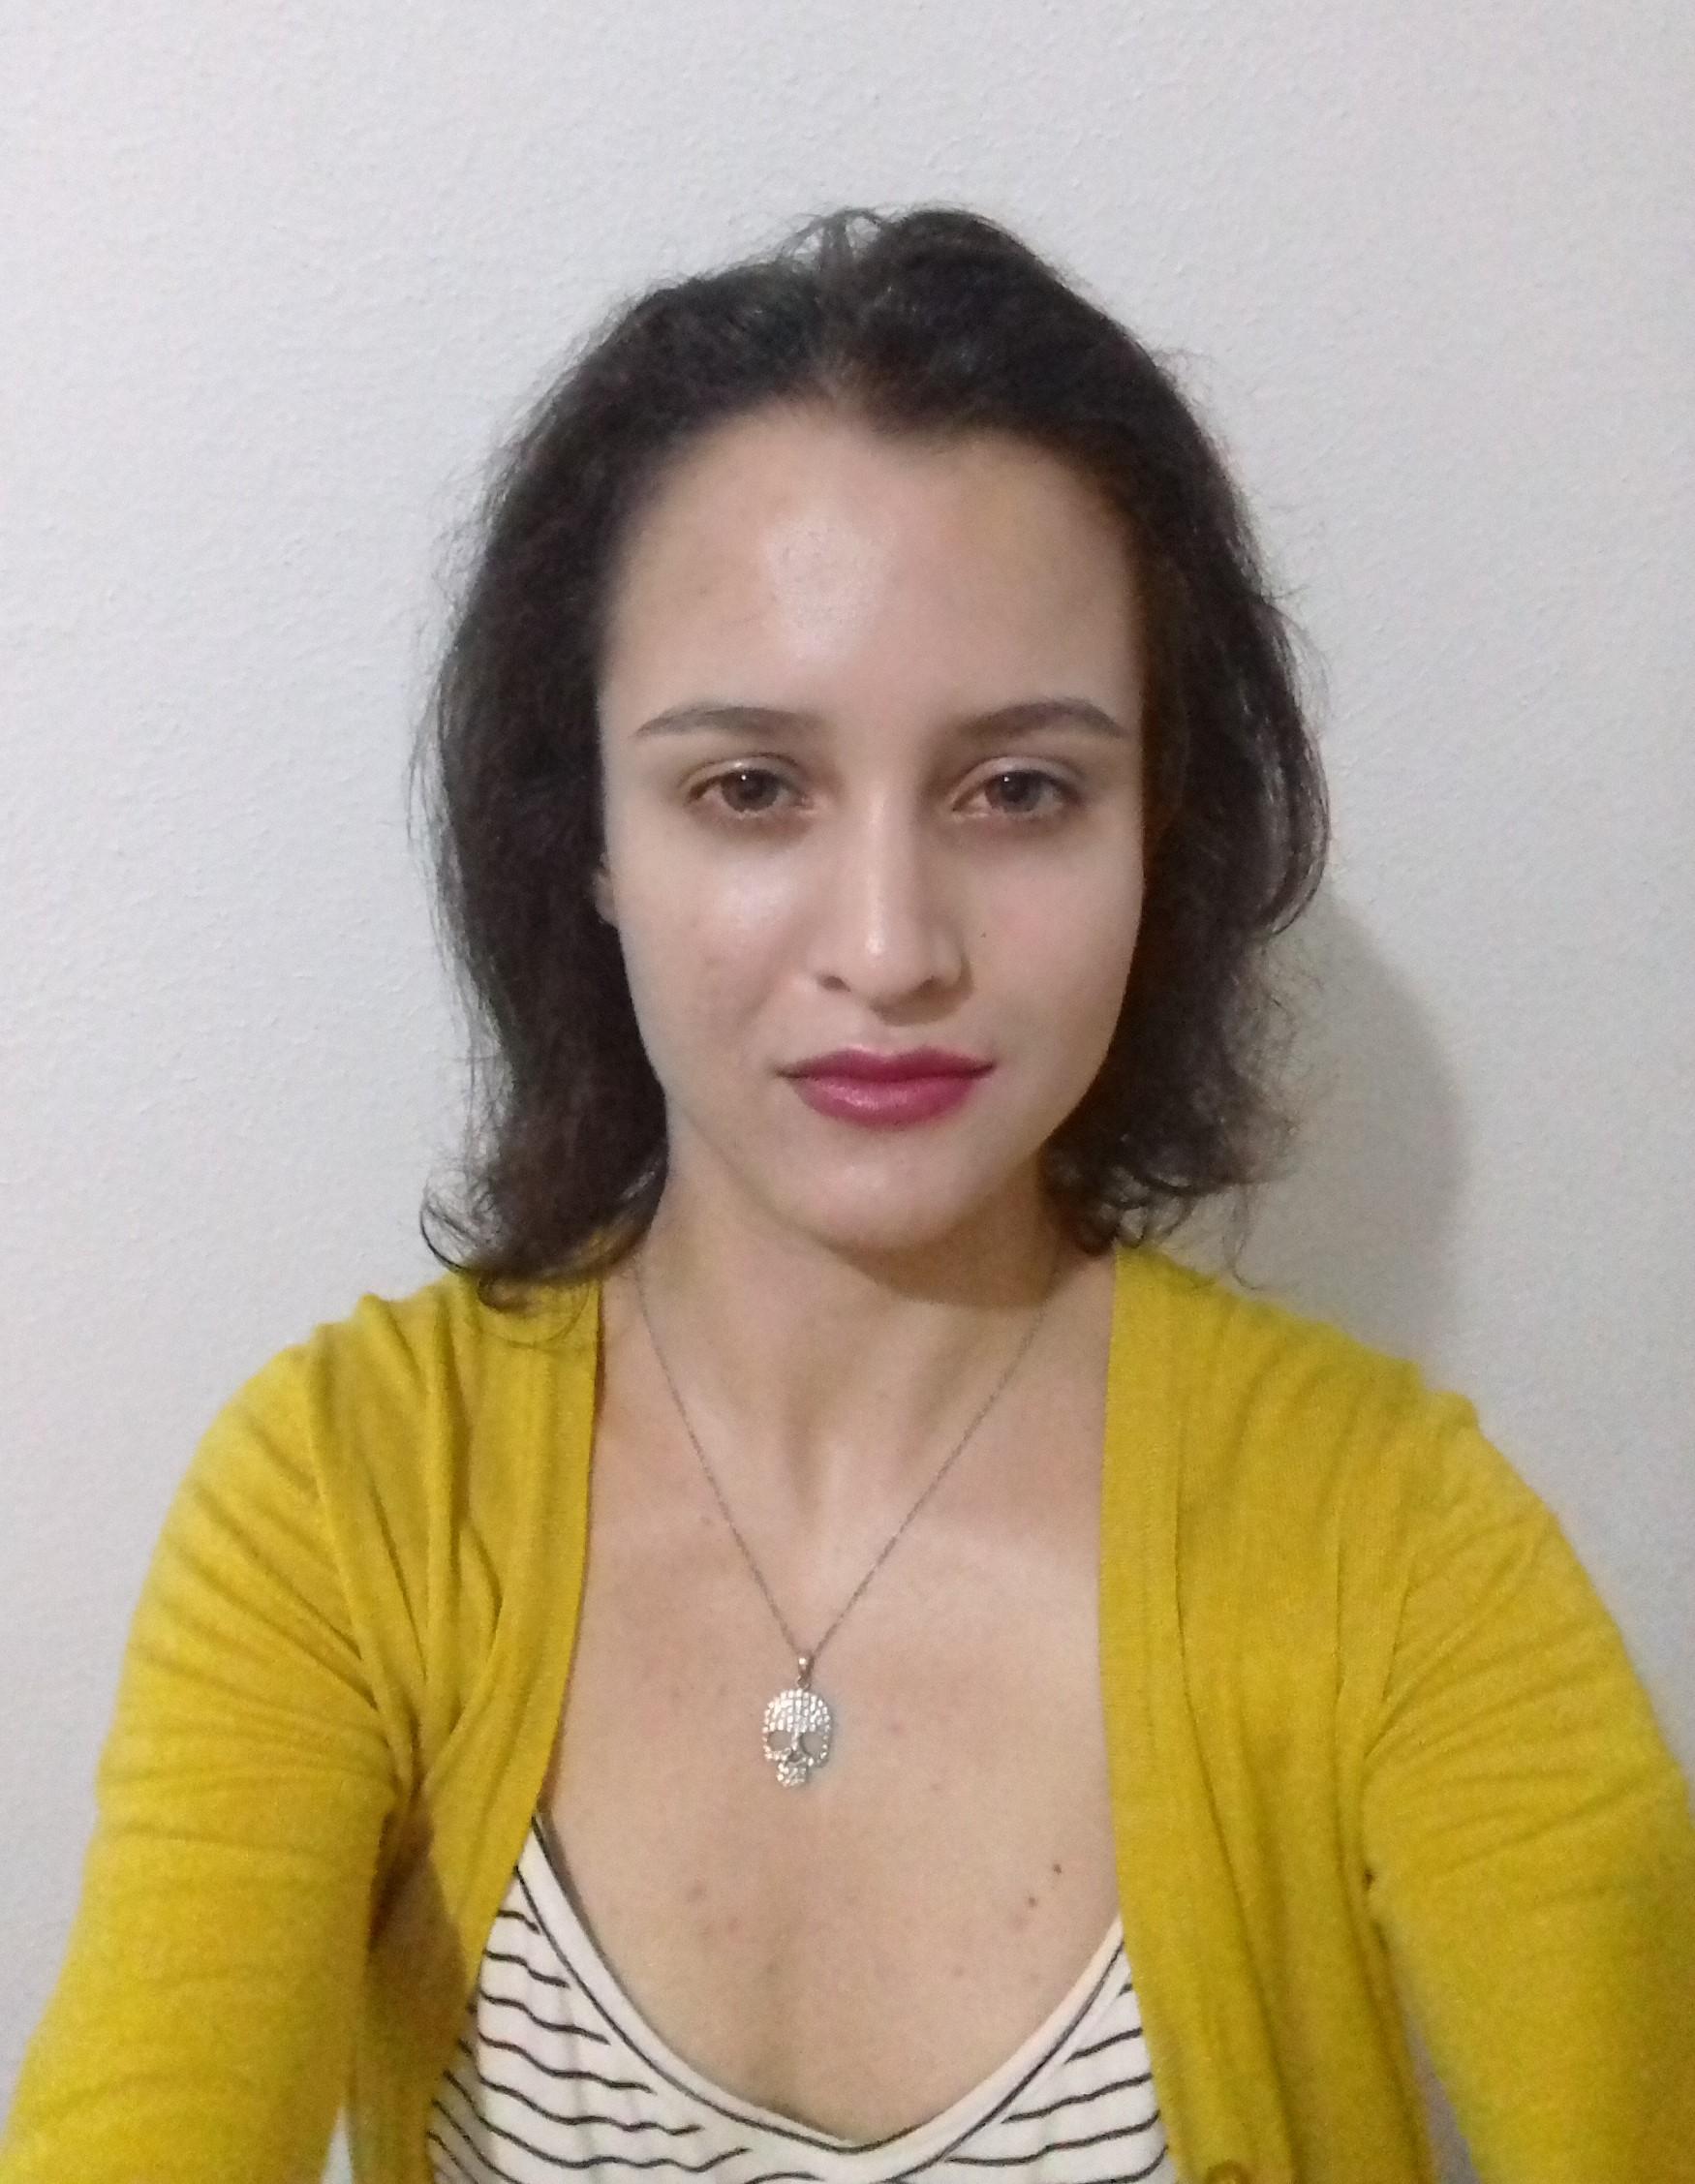 Leiliane Souza